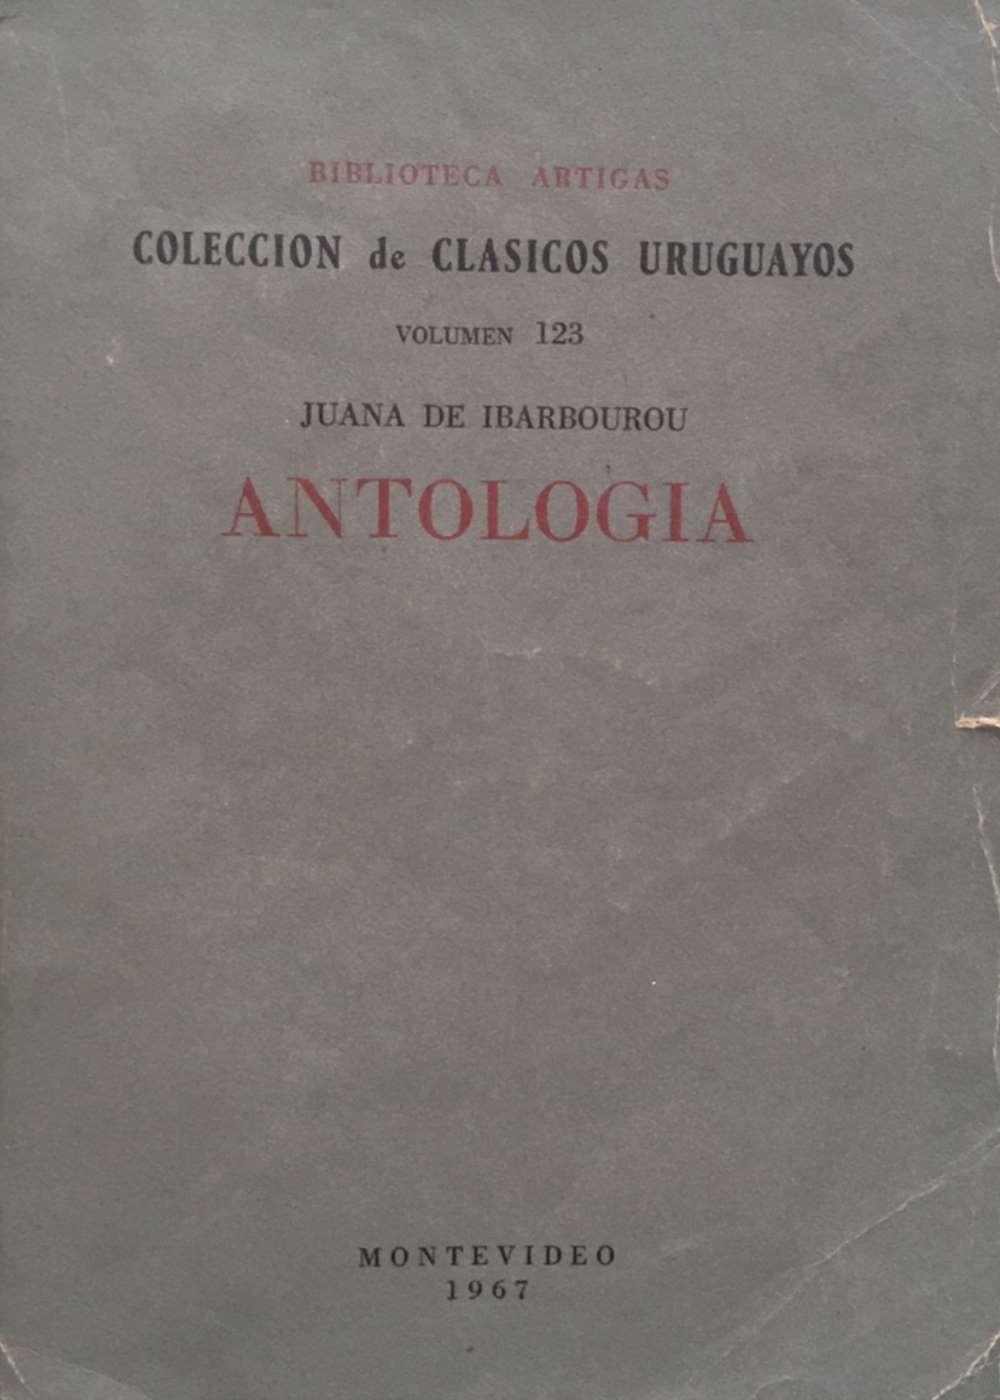 Antología Juana de Ibarbourou